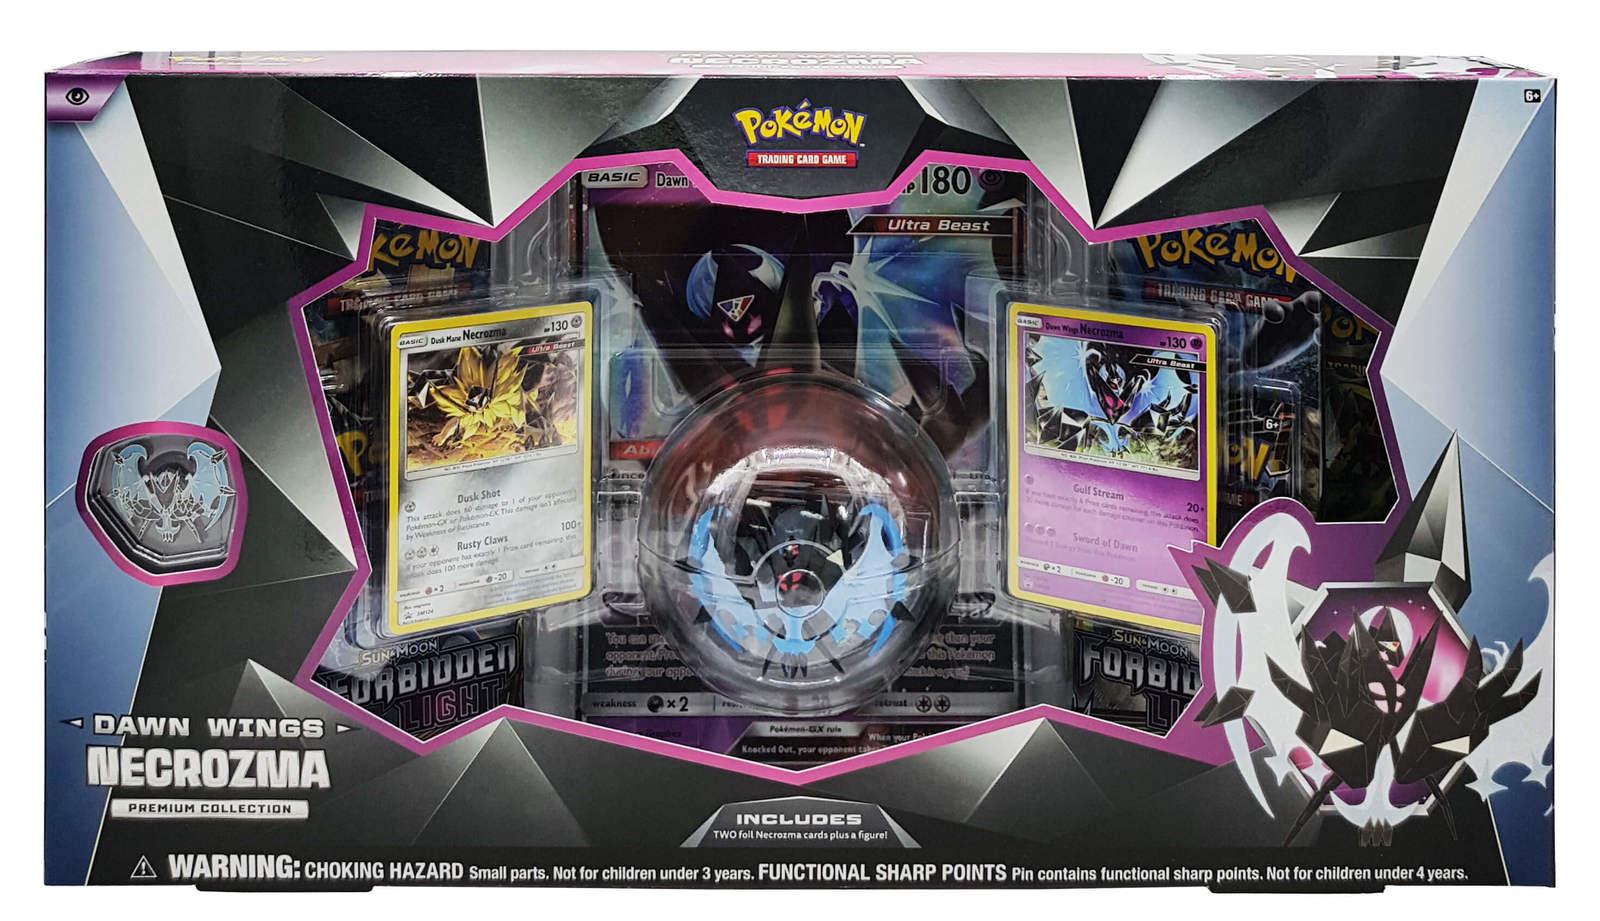 Pokemon Tcg Premium Collection Dawn Wing Necrozma At